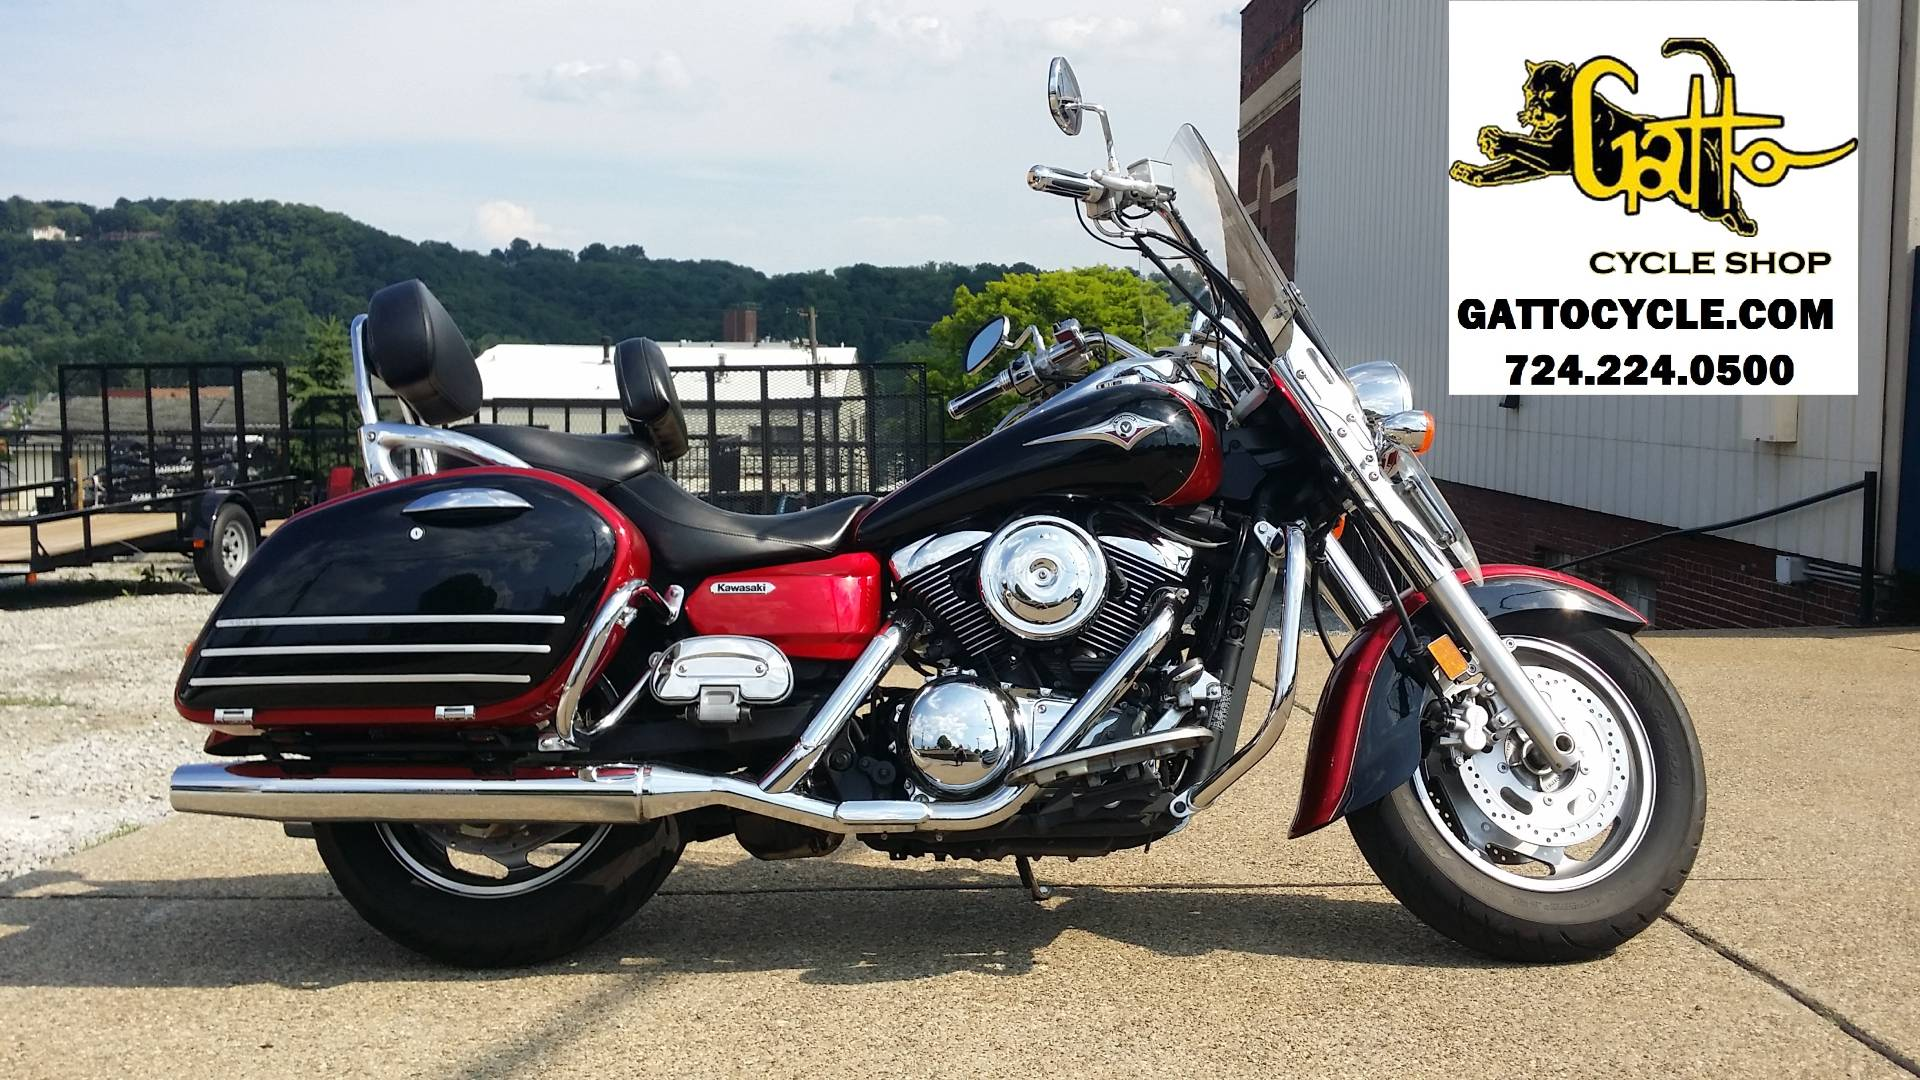 Used 2008 Kawasaki Vulcan® 1600 Nomad™ Motorcycles in Tarentum, PA ...